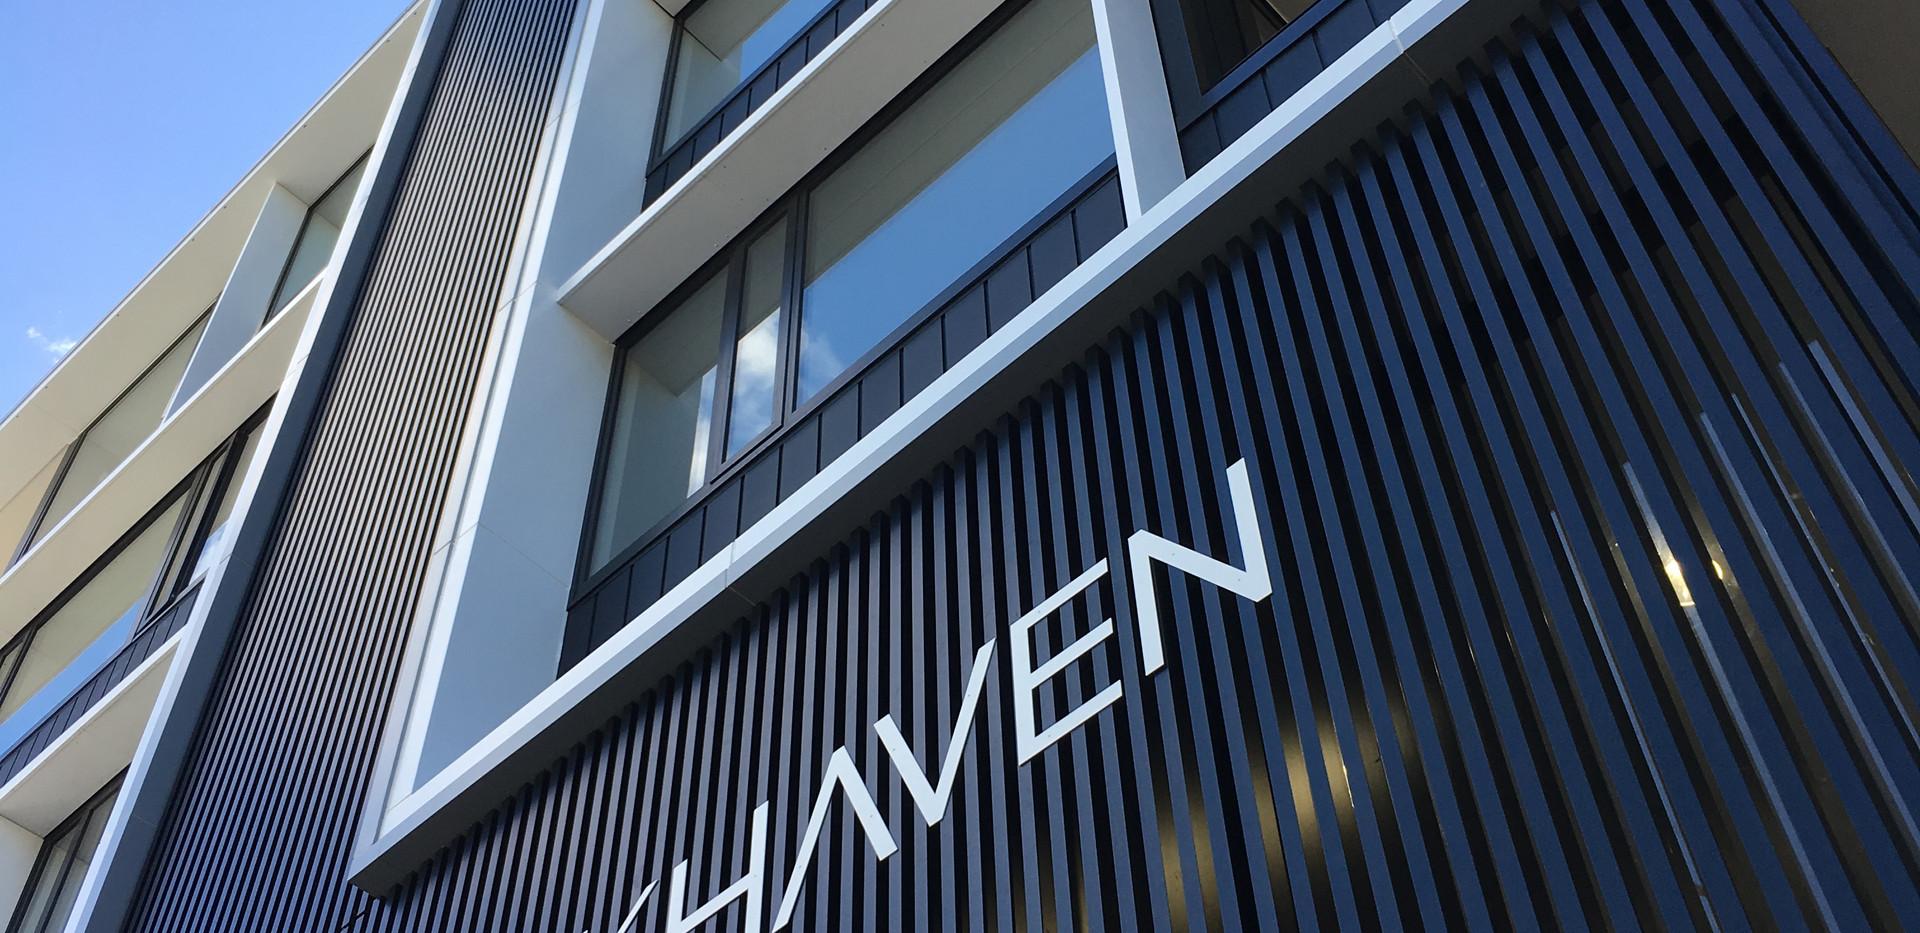 Park Haven 1 Watertight Construction